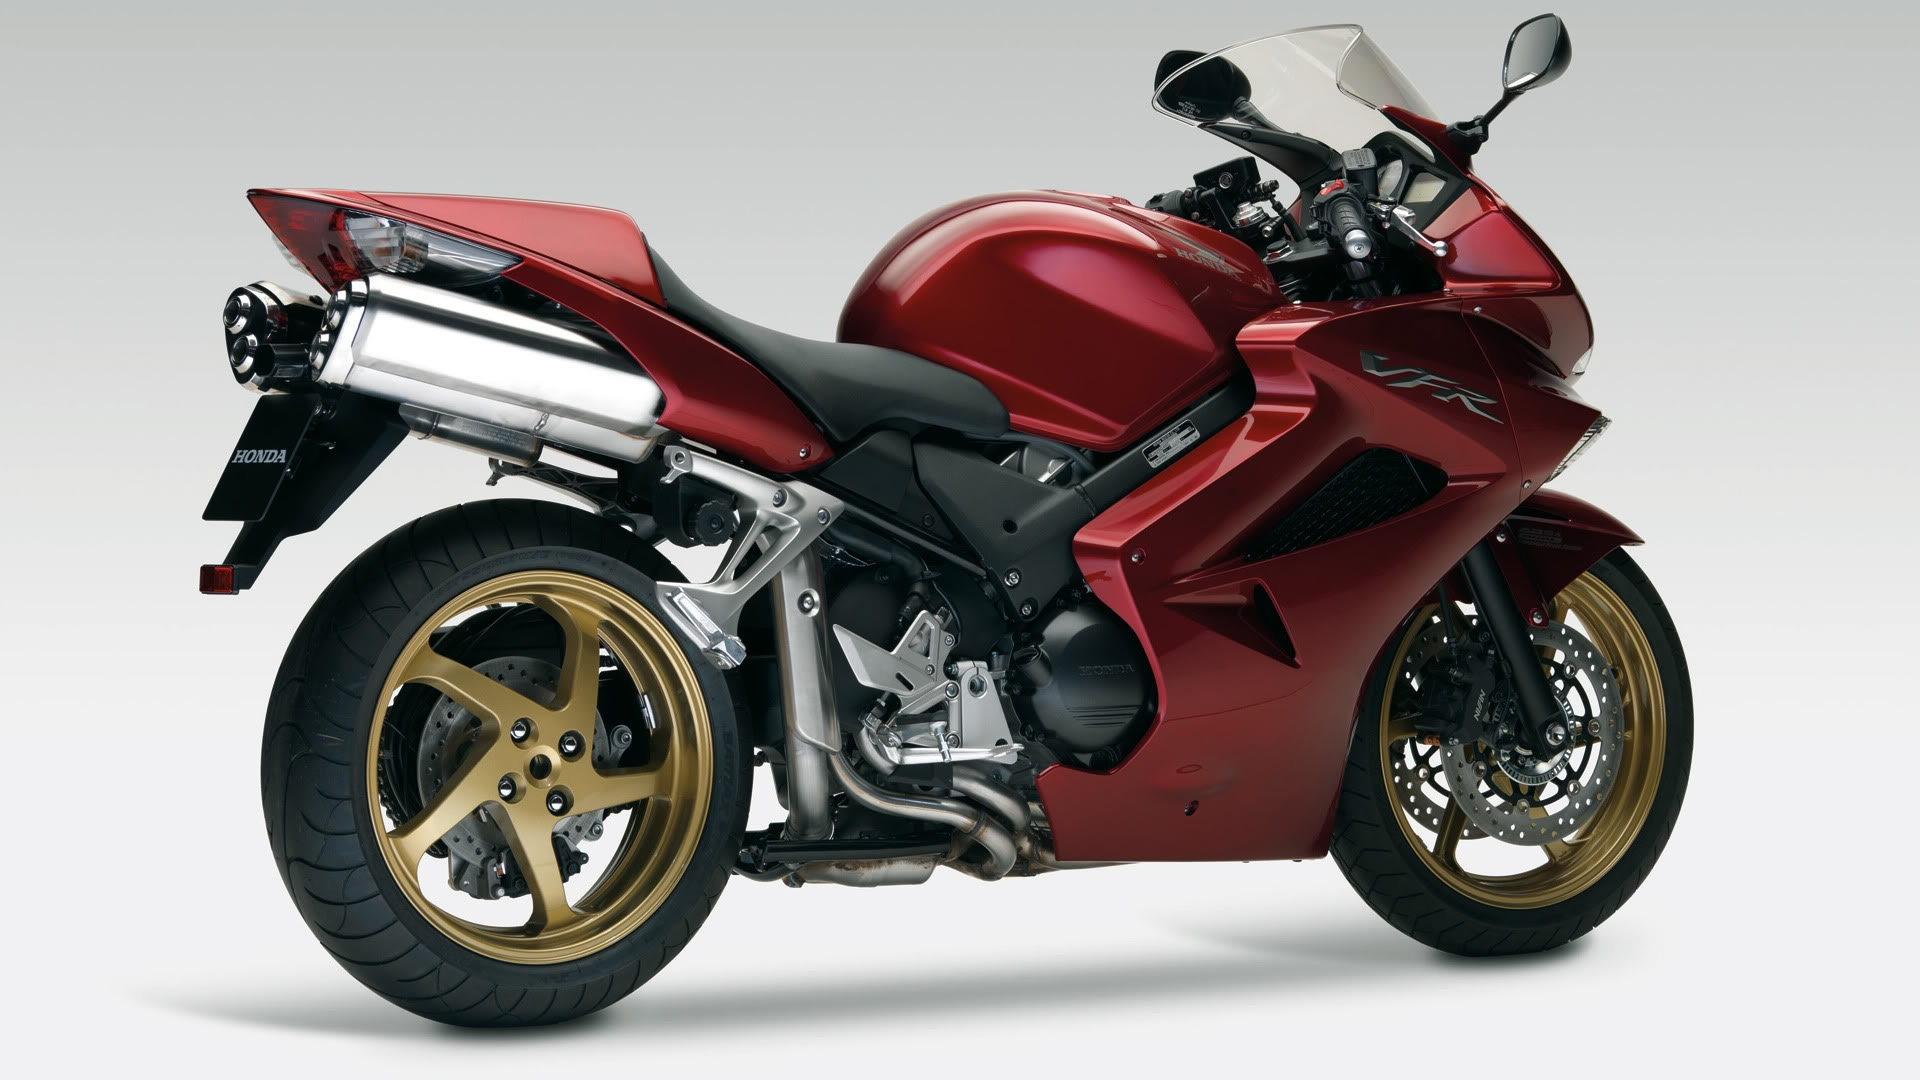 nouveaut pneu moto 2016 dunlop sportmax roadsmart iii. Black Bedroom Furniture Sets. Home Design Ideas